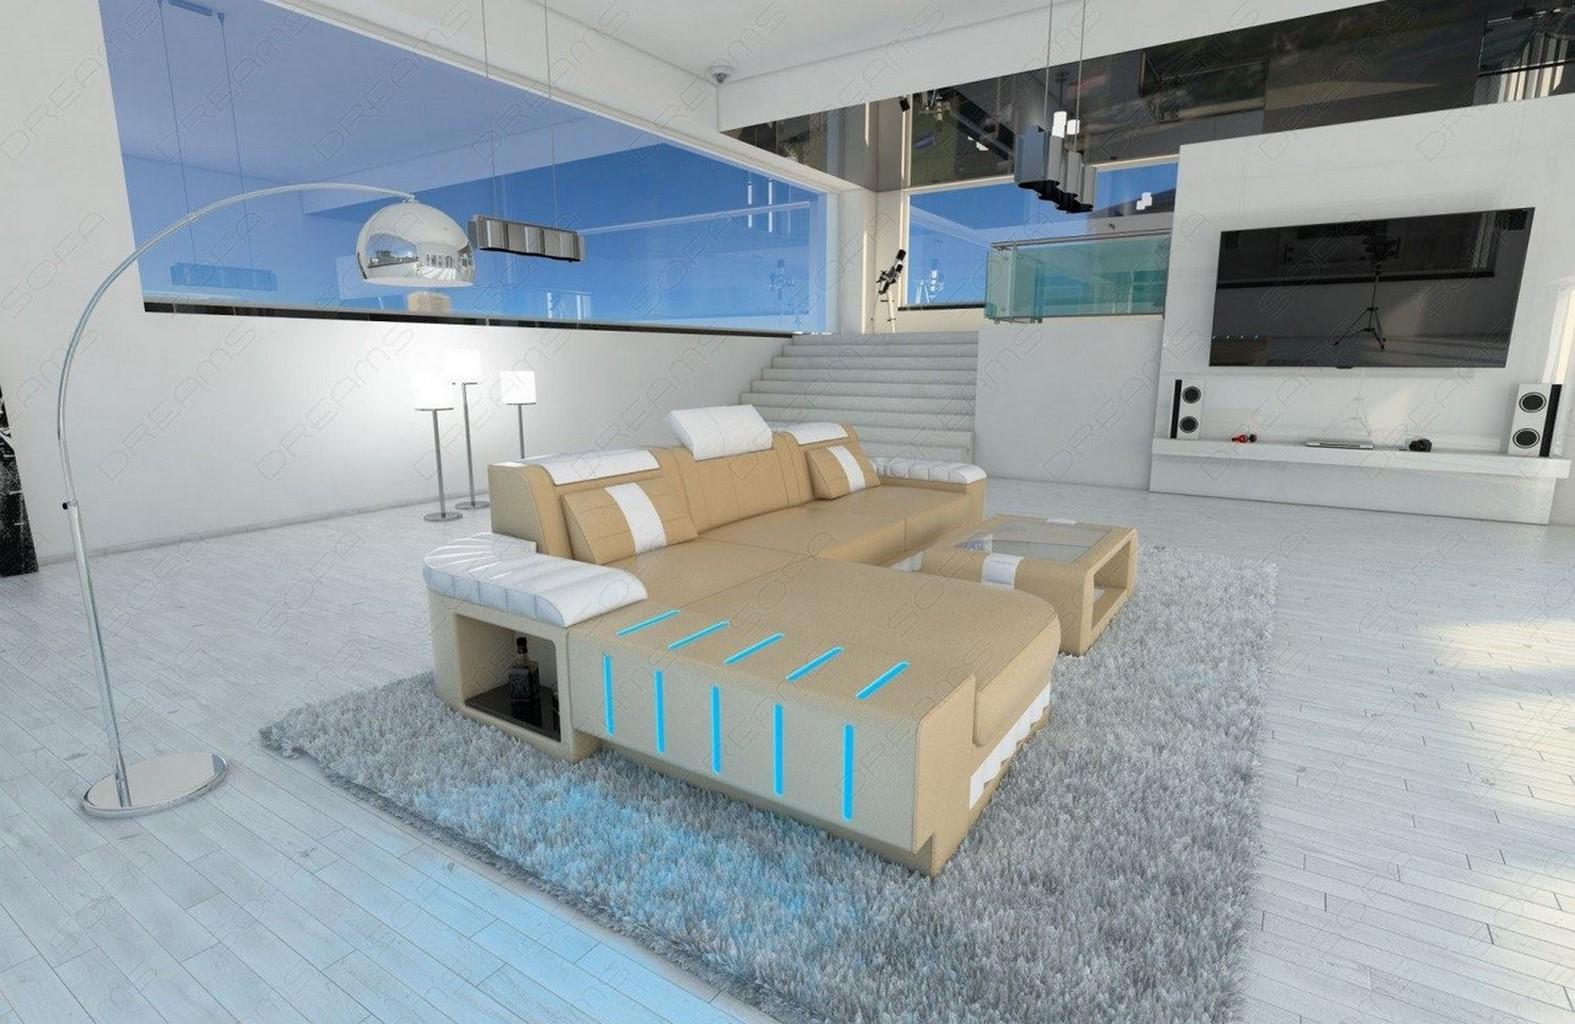 designsofa eckcouch bellagio l f rmig integrierte led. Black Bedroom Furniture Sets. Home Design Ideas